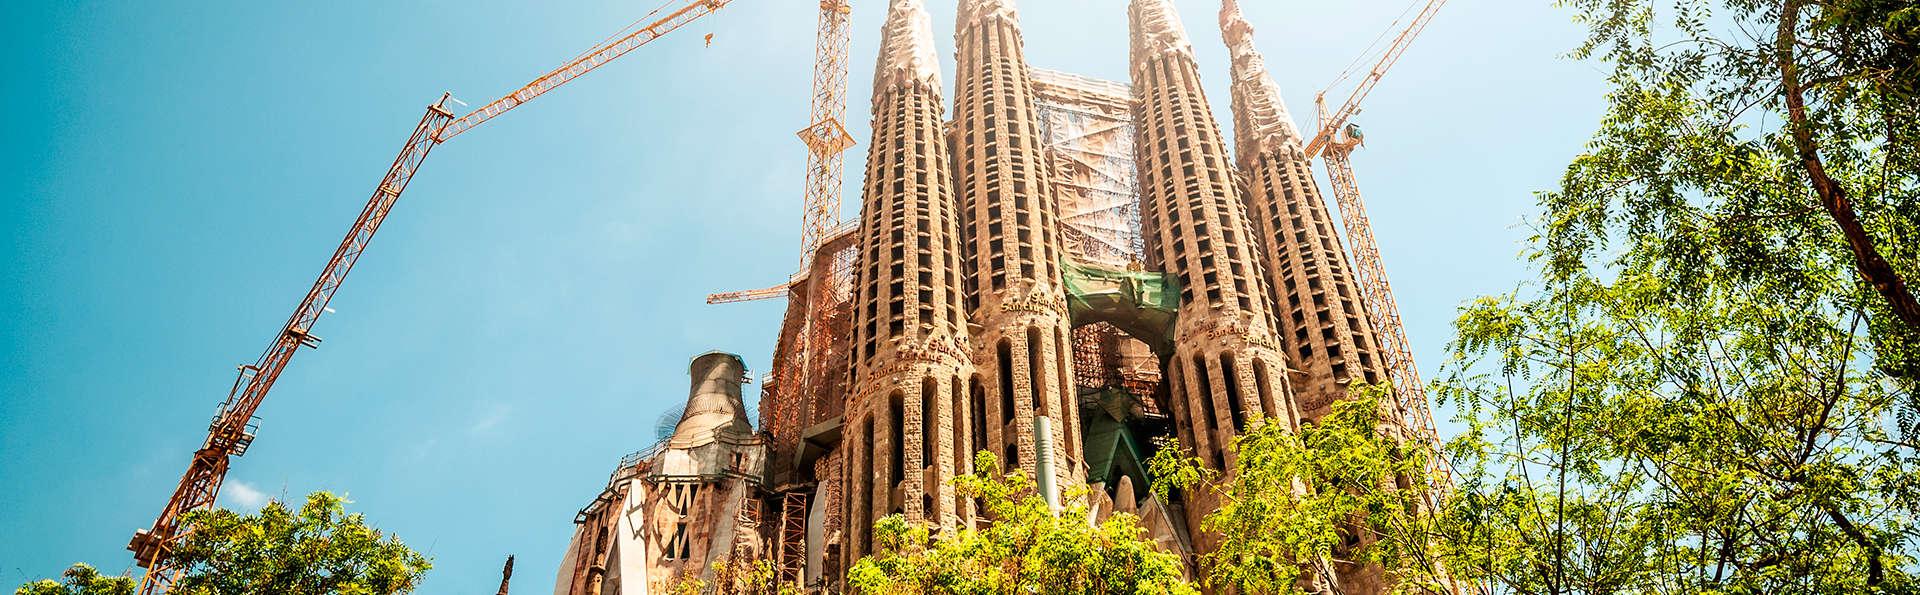 Séjournez Paseo de Gracia et visitez la Sagrada Familia